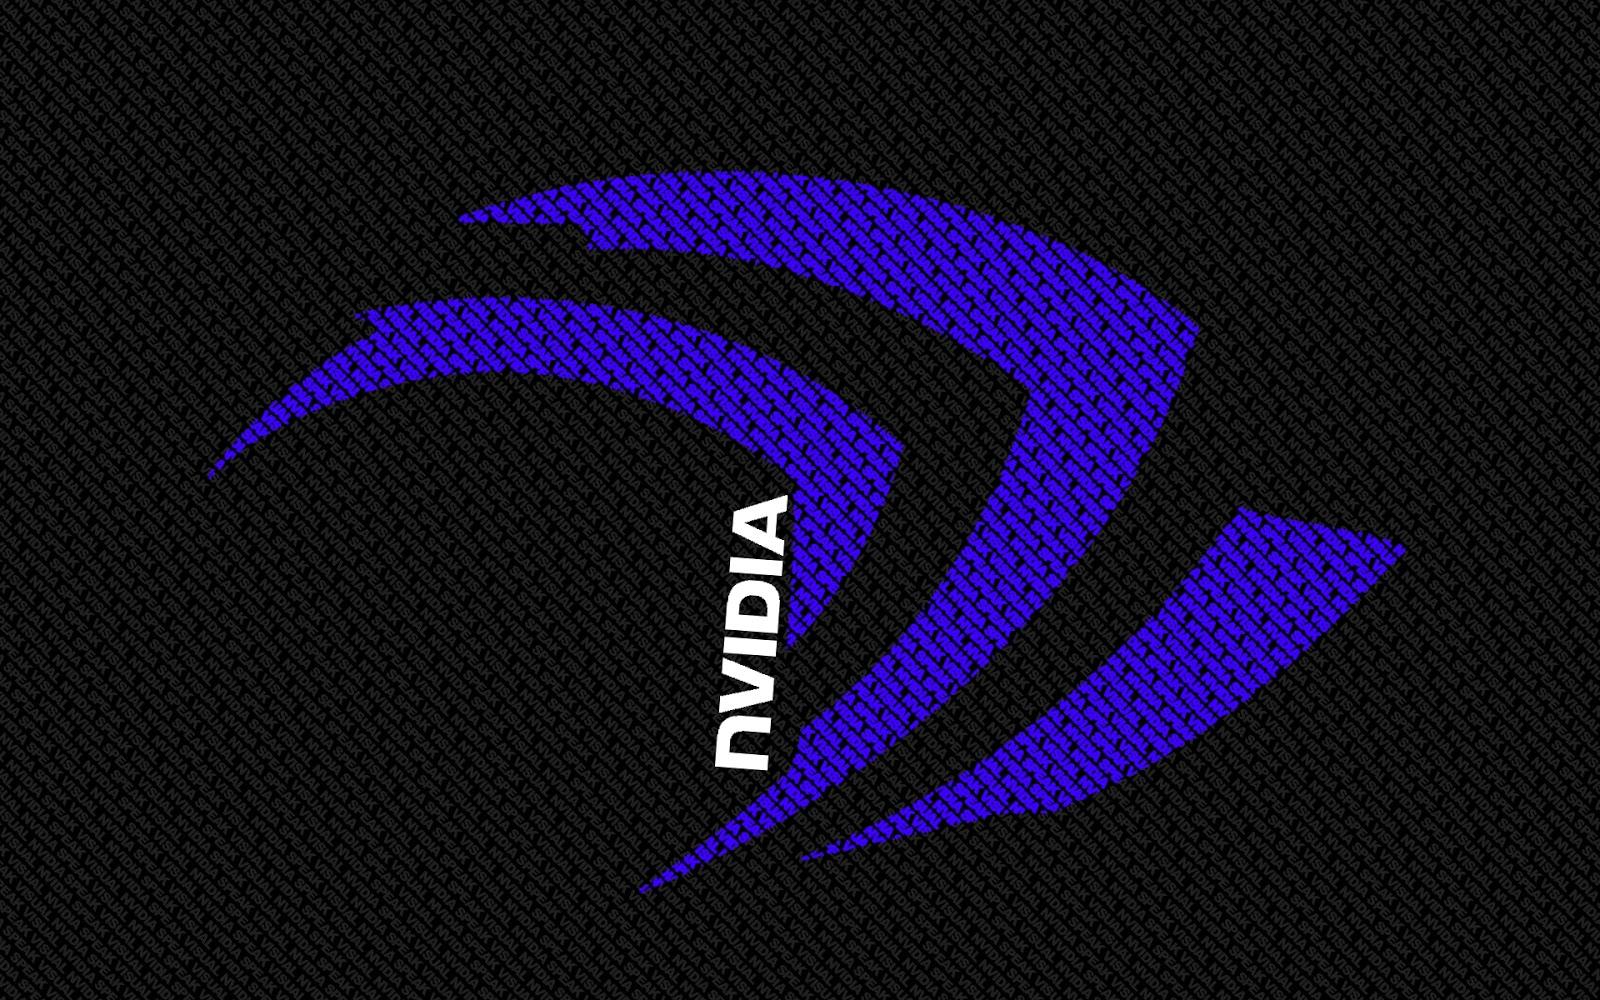 Shine HD Wallpapers: NVIDIA Wallpapers - 479.2KB